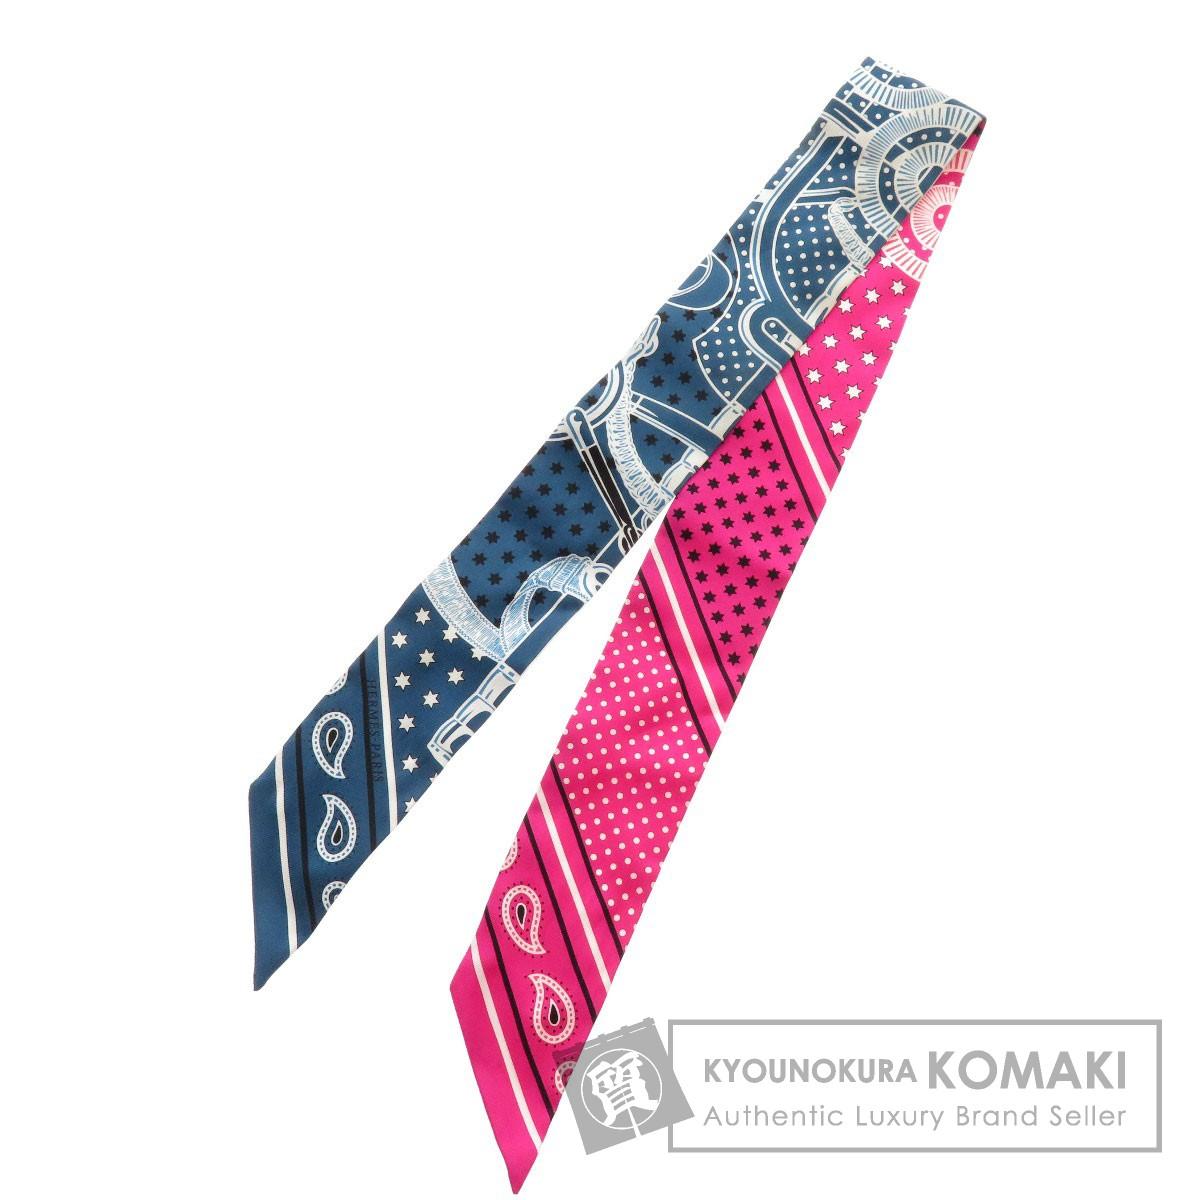 HERMES ツイリードット×スターデザイン スカーフ シルク レディース 【中古】【エルメス】